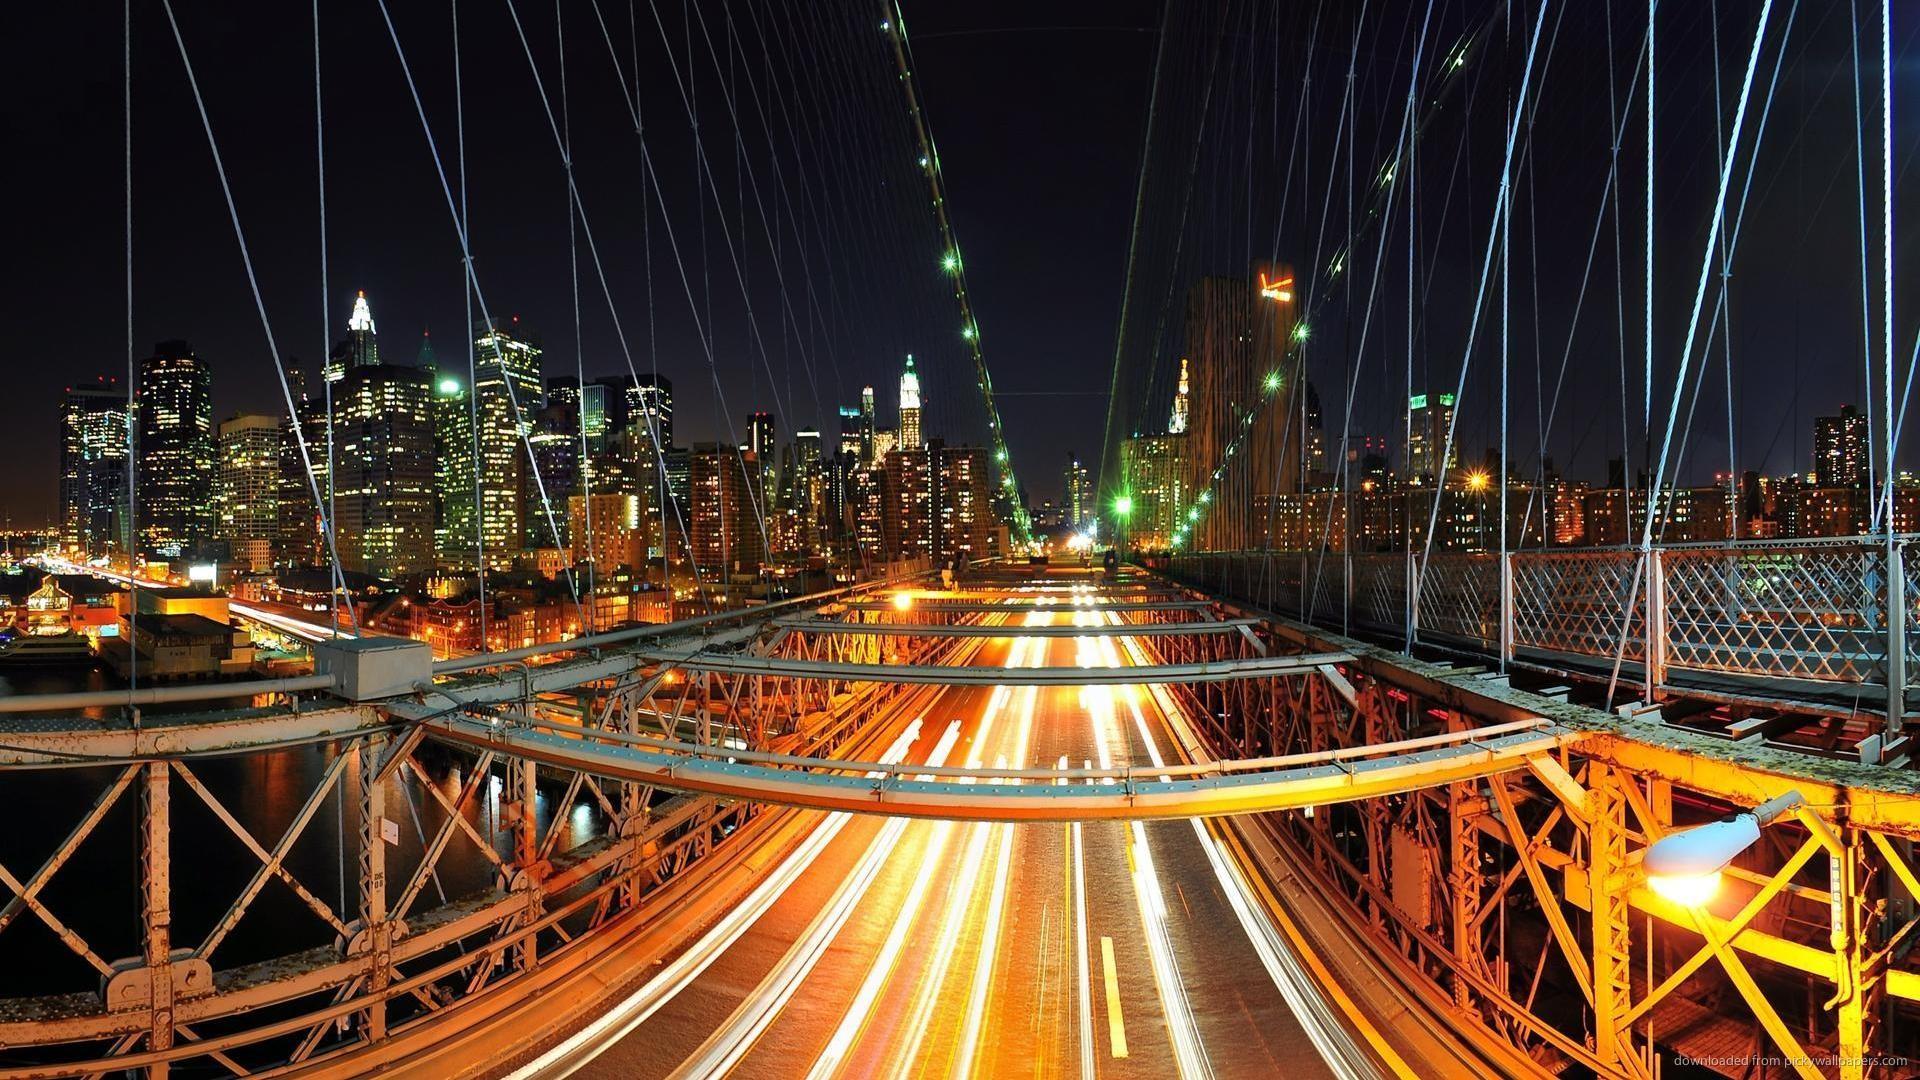 HD New York bridge at night wallpaper